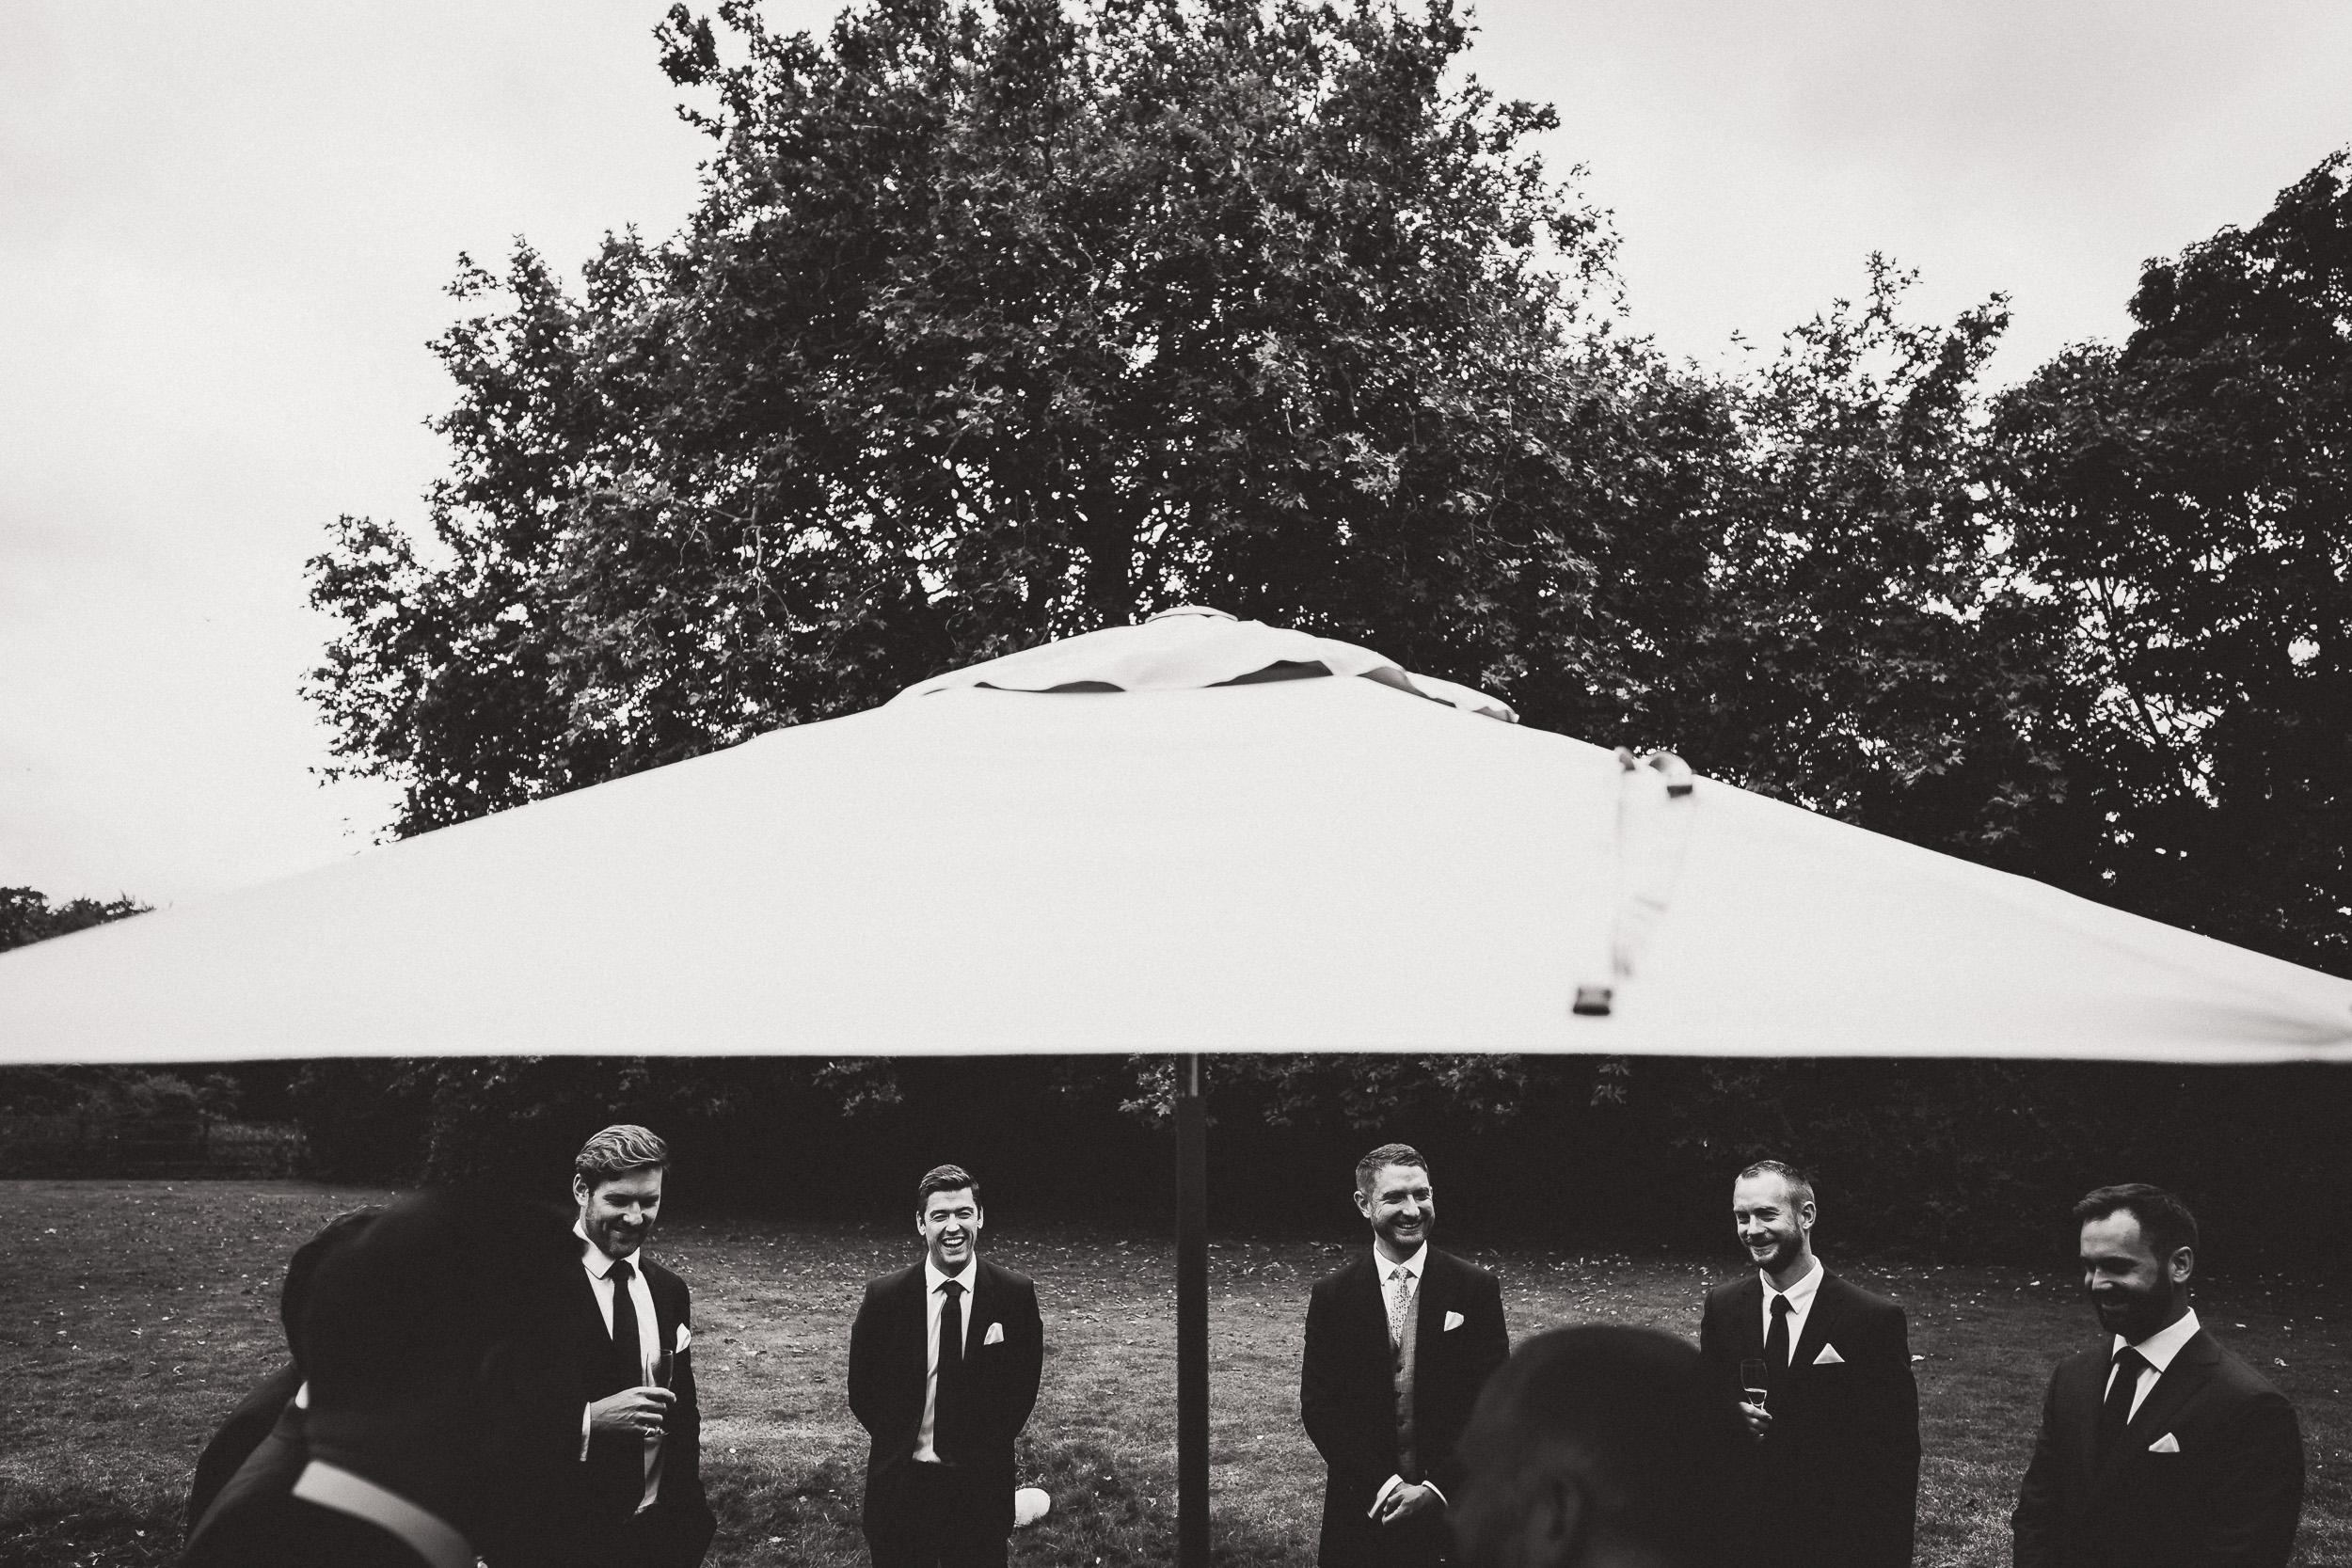 Voewood Wedding Photography | Al & Clancy Al ss 017